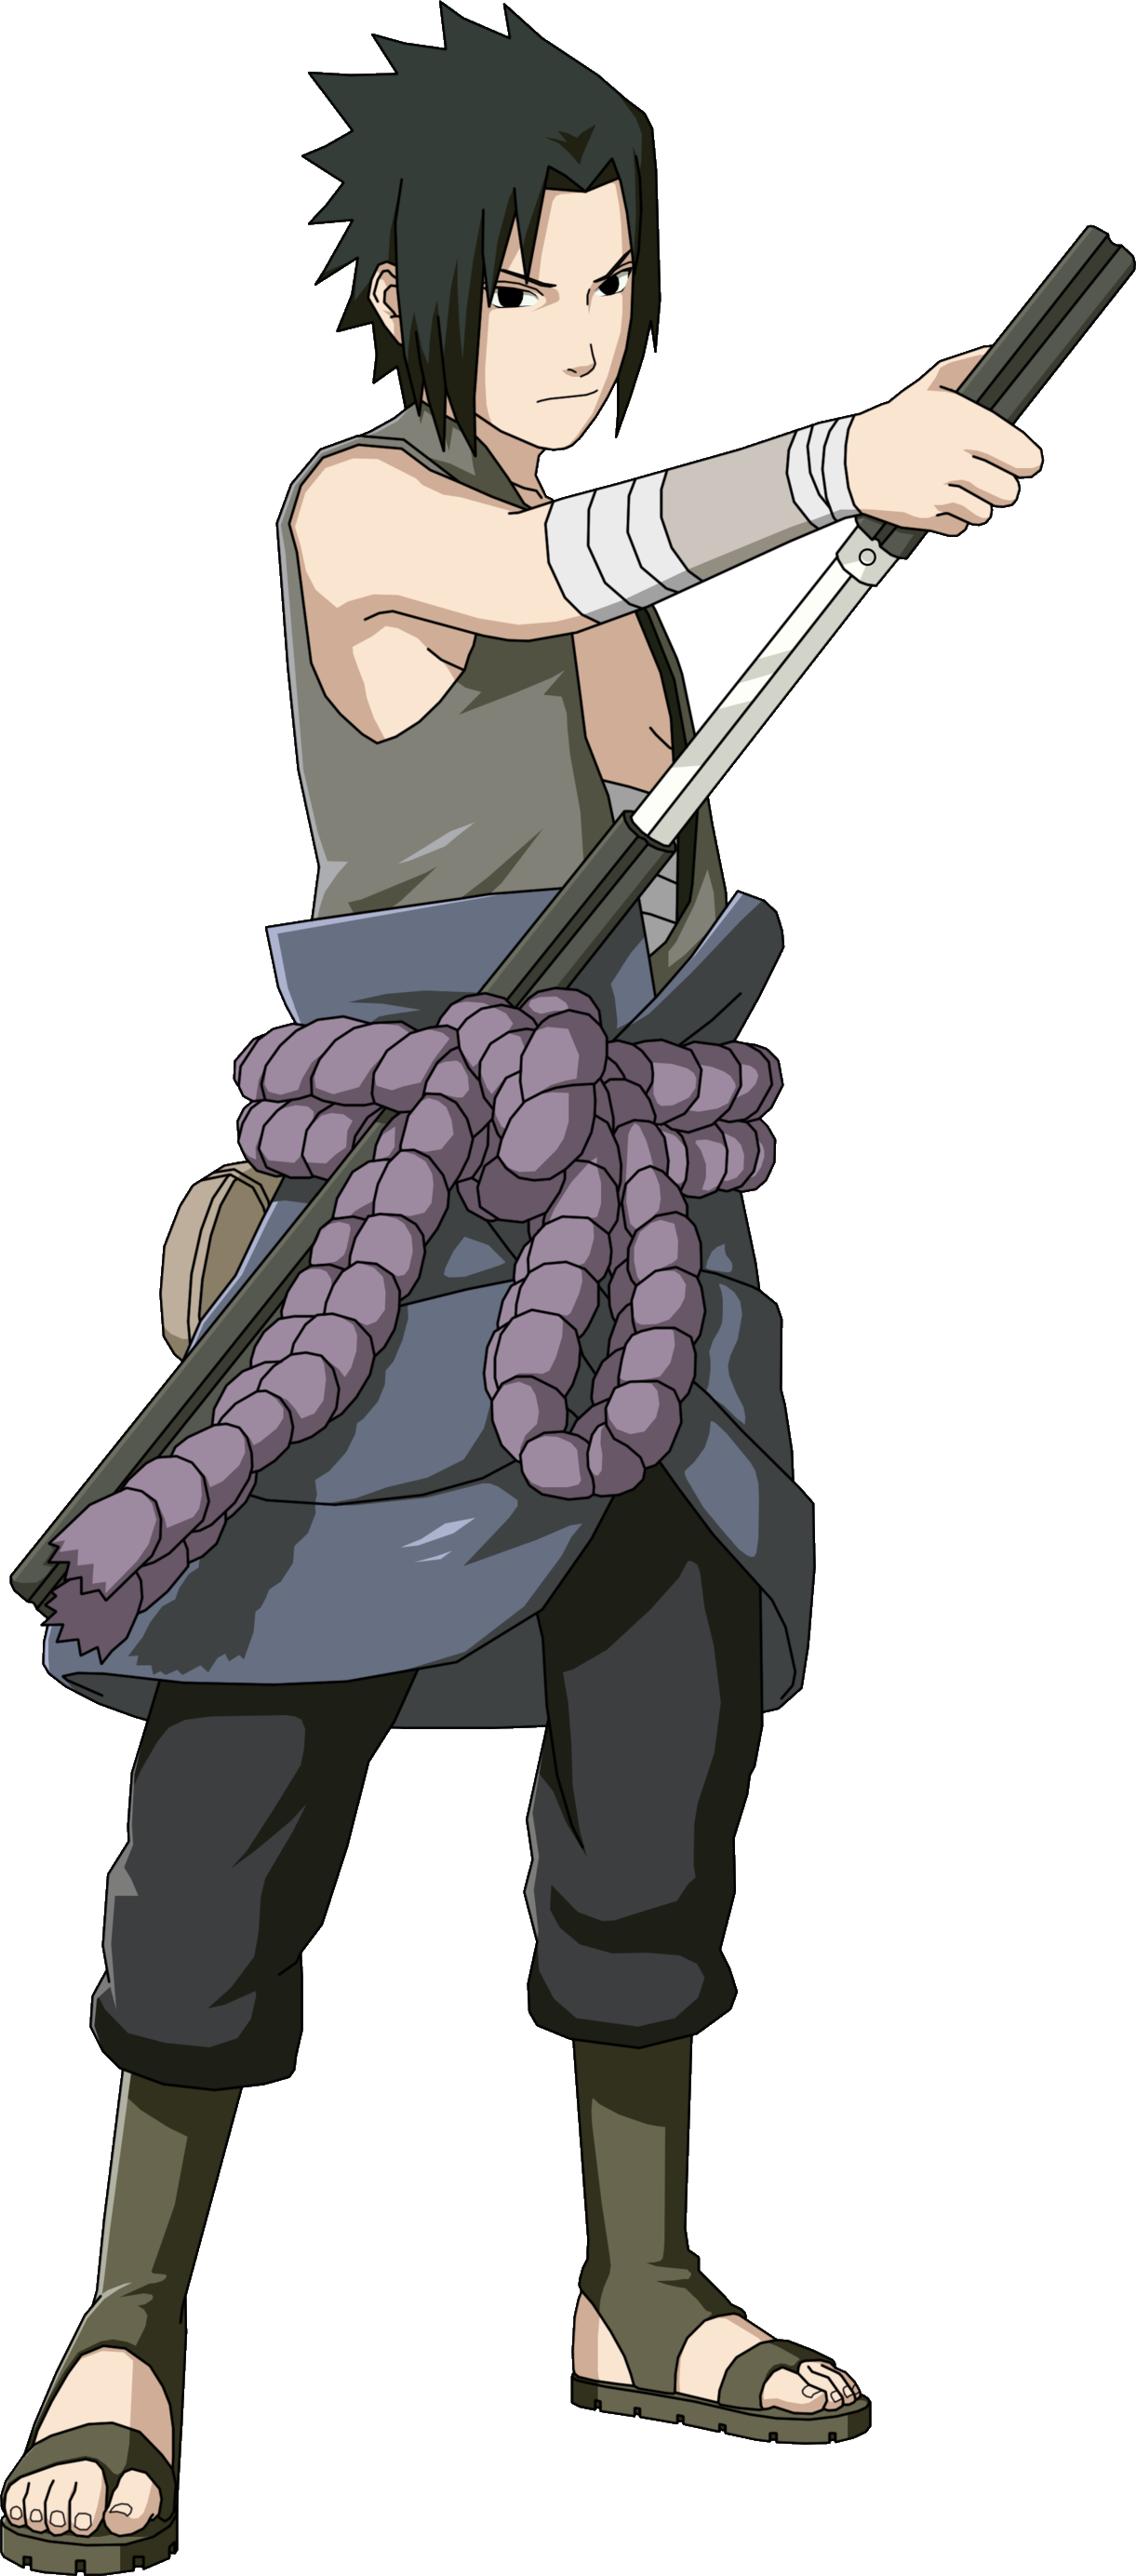 Sasuke Uchiha (Cdswalkthrough) | Naruto Fanon Wiki | Fandom powered by ...